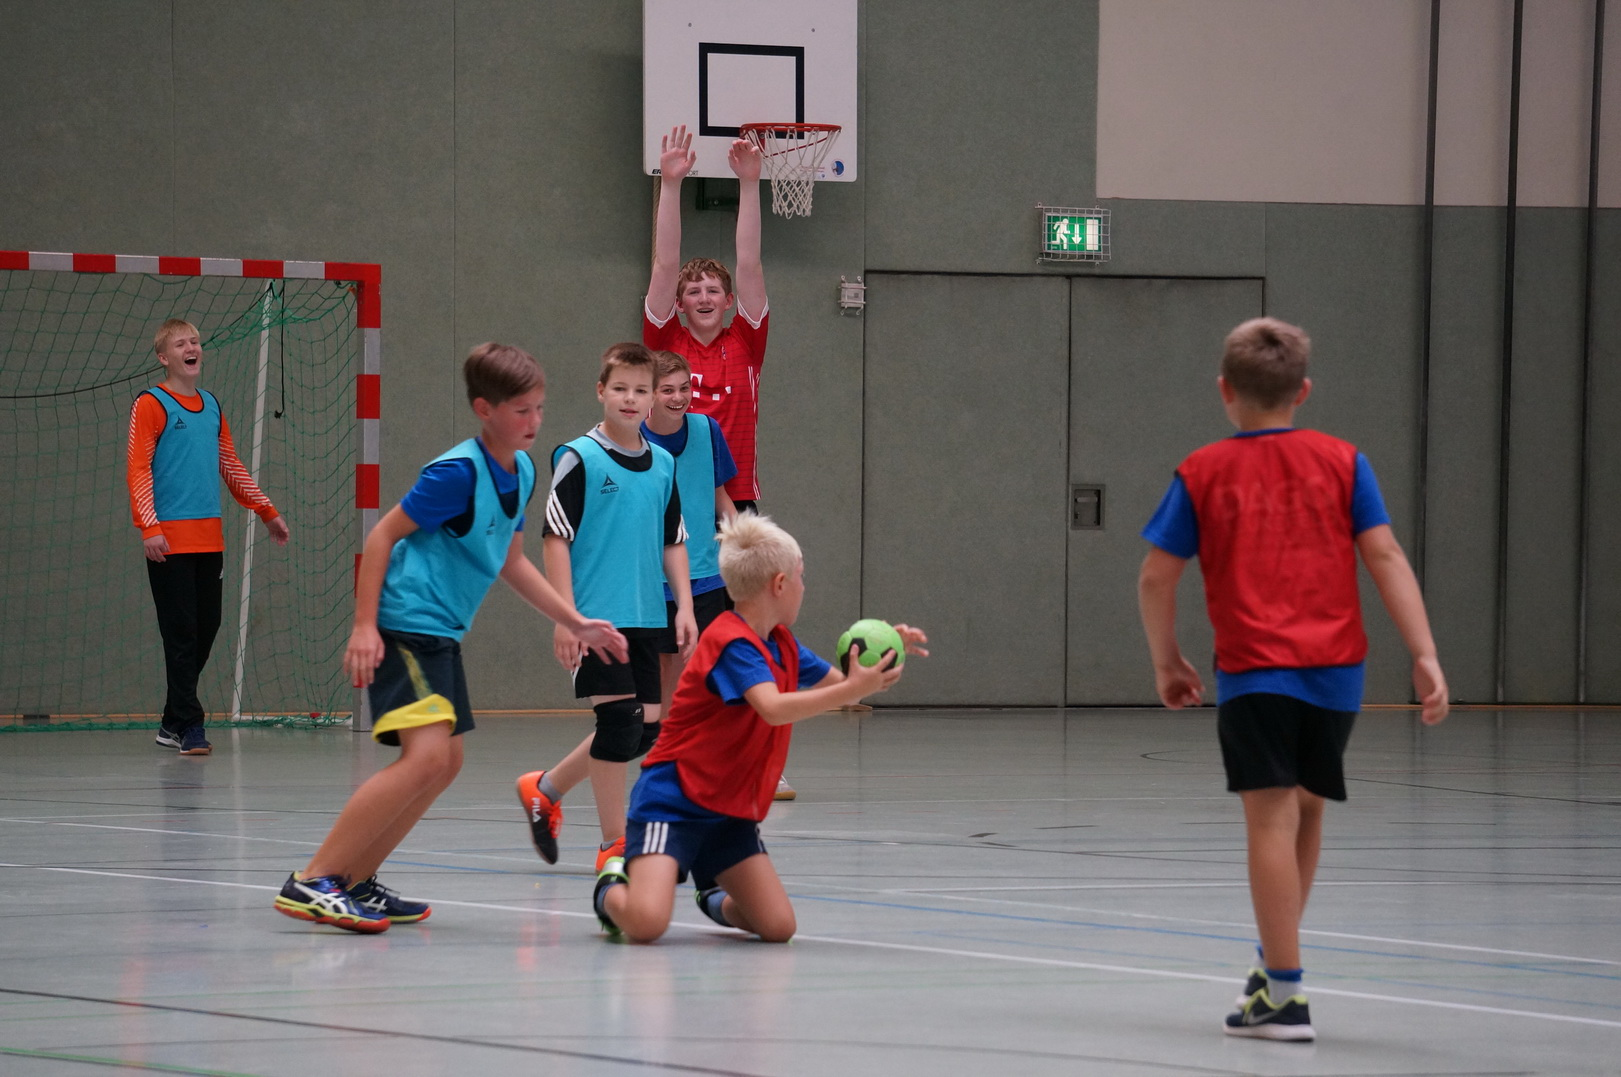 201808_Handballcamp_SDH_MG_269w